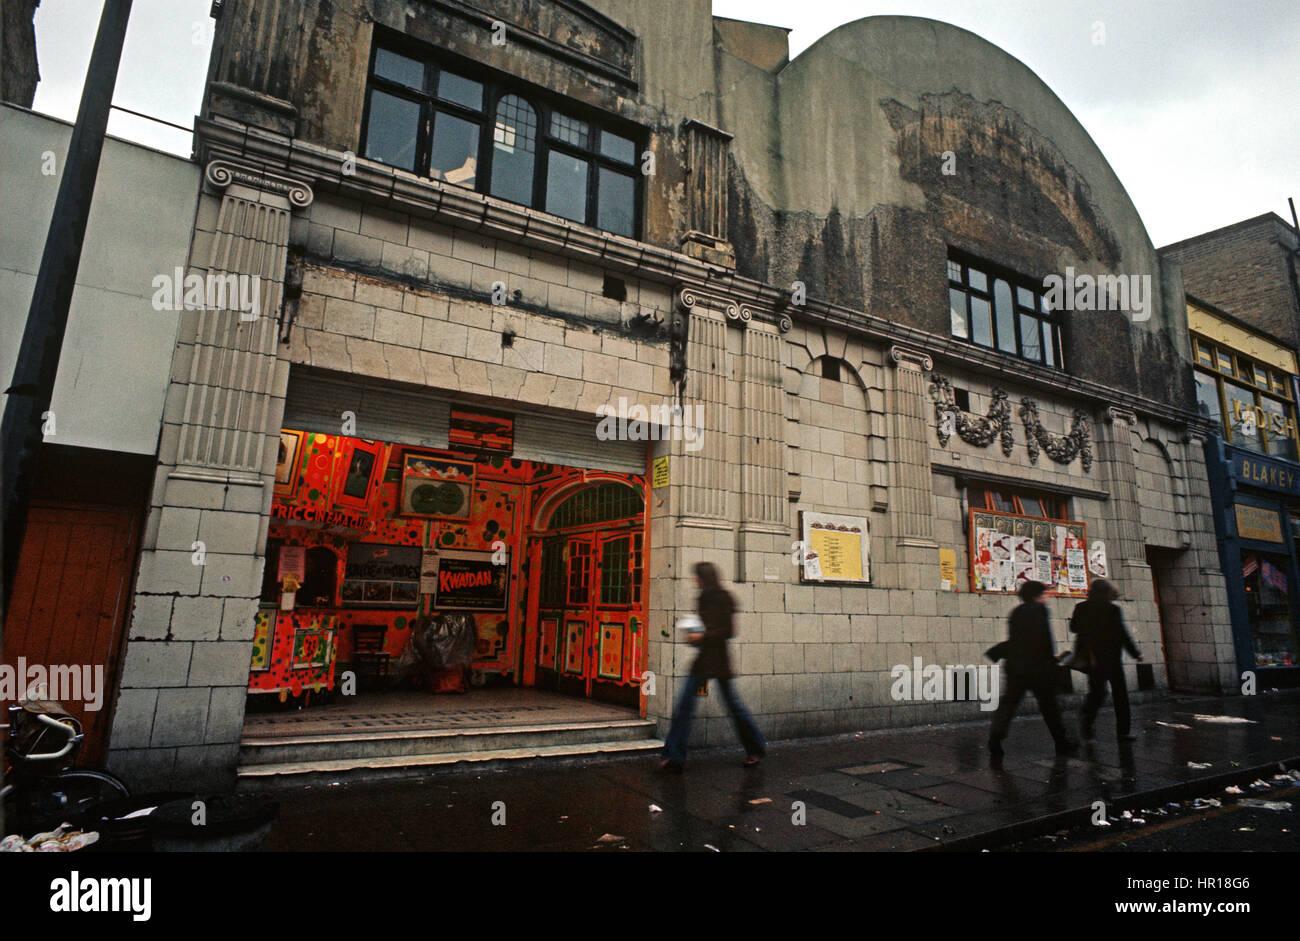 ELECTRIC CINEMA, PORTOBELLO, NOTTING HILL, NORTH KENSINGTON, LONDON, 1972 - Stock Image